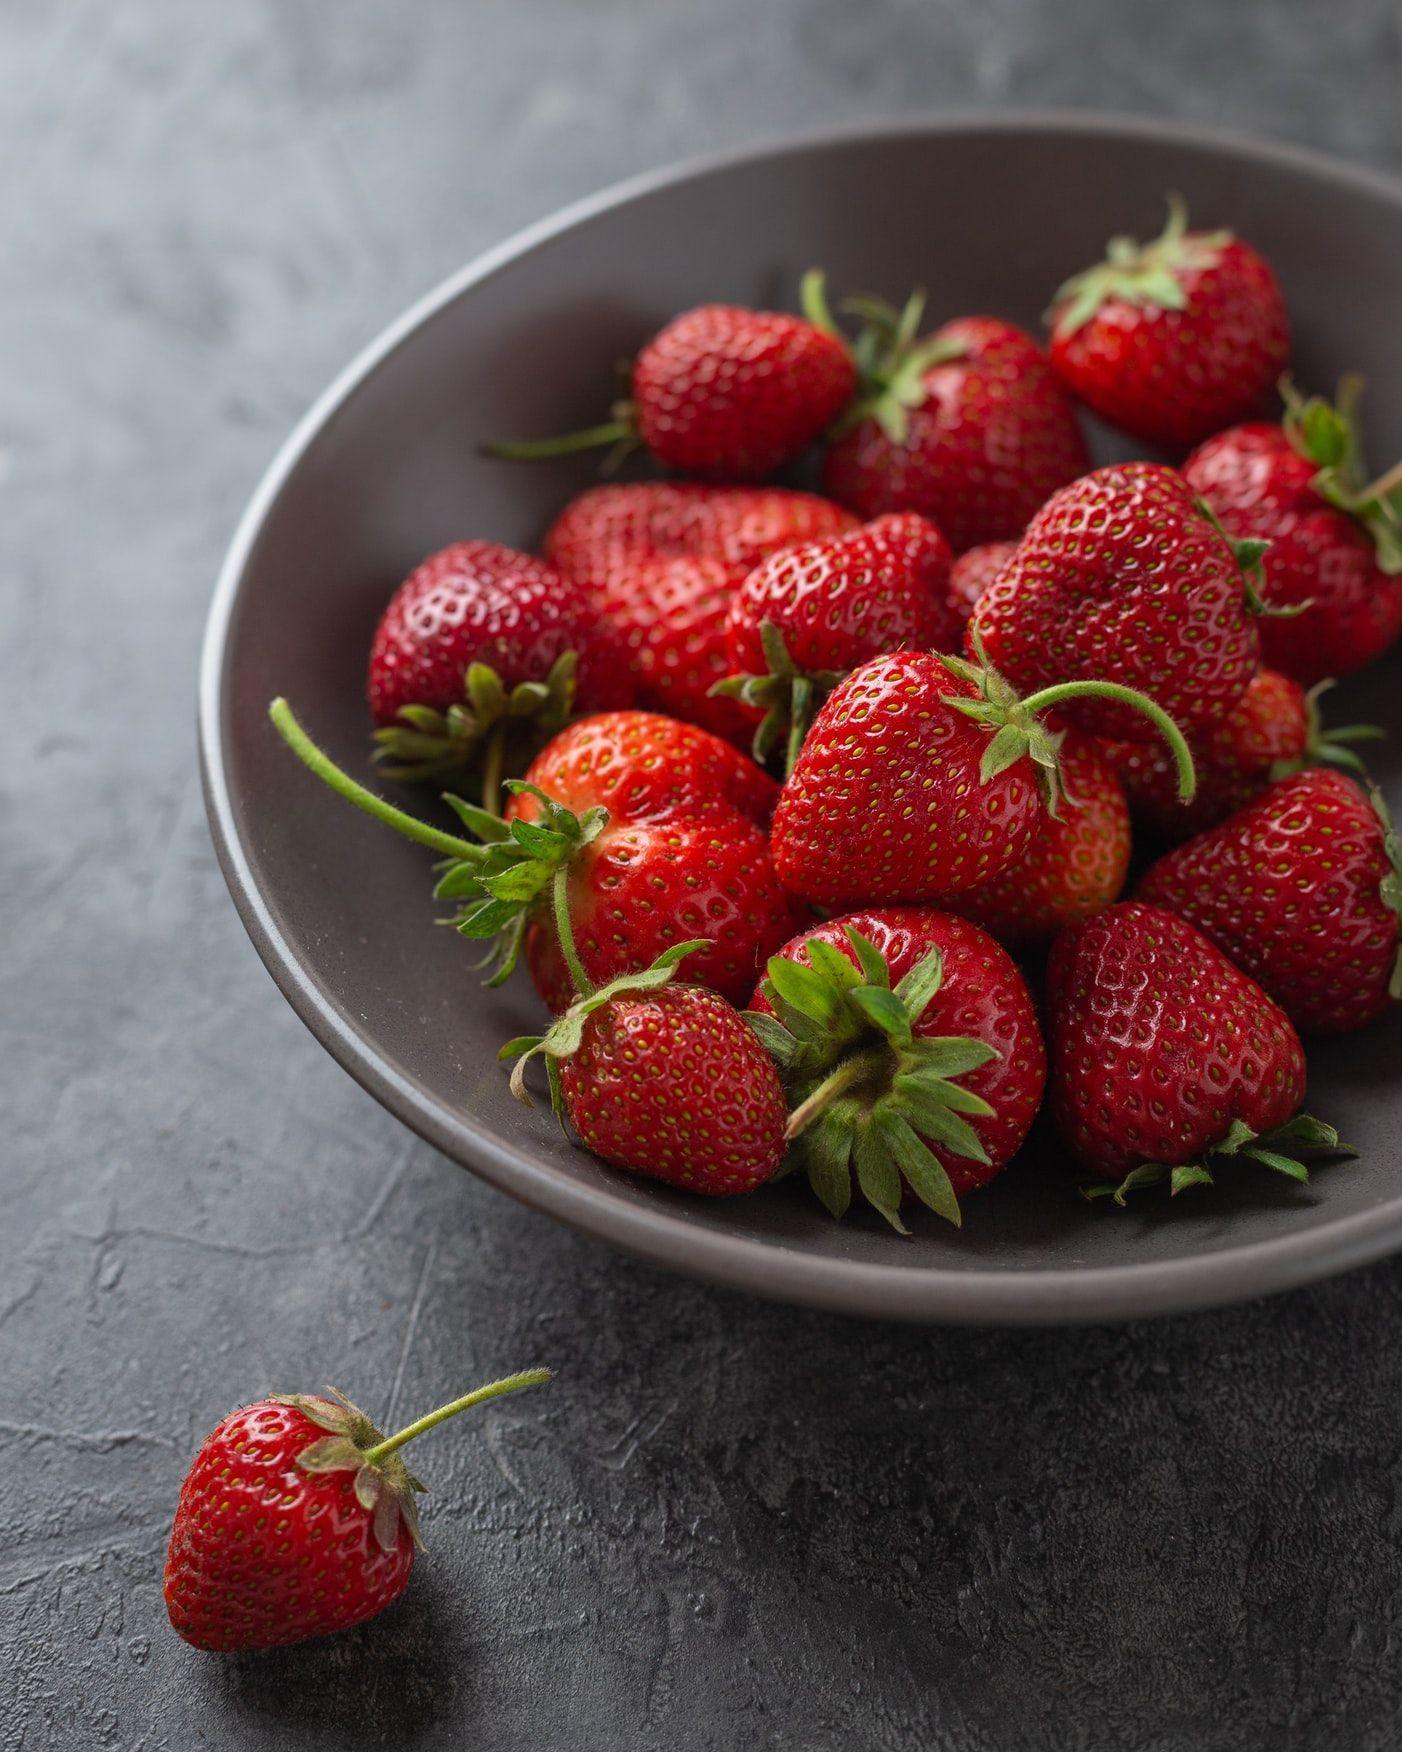 Strawberries August What's In Season